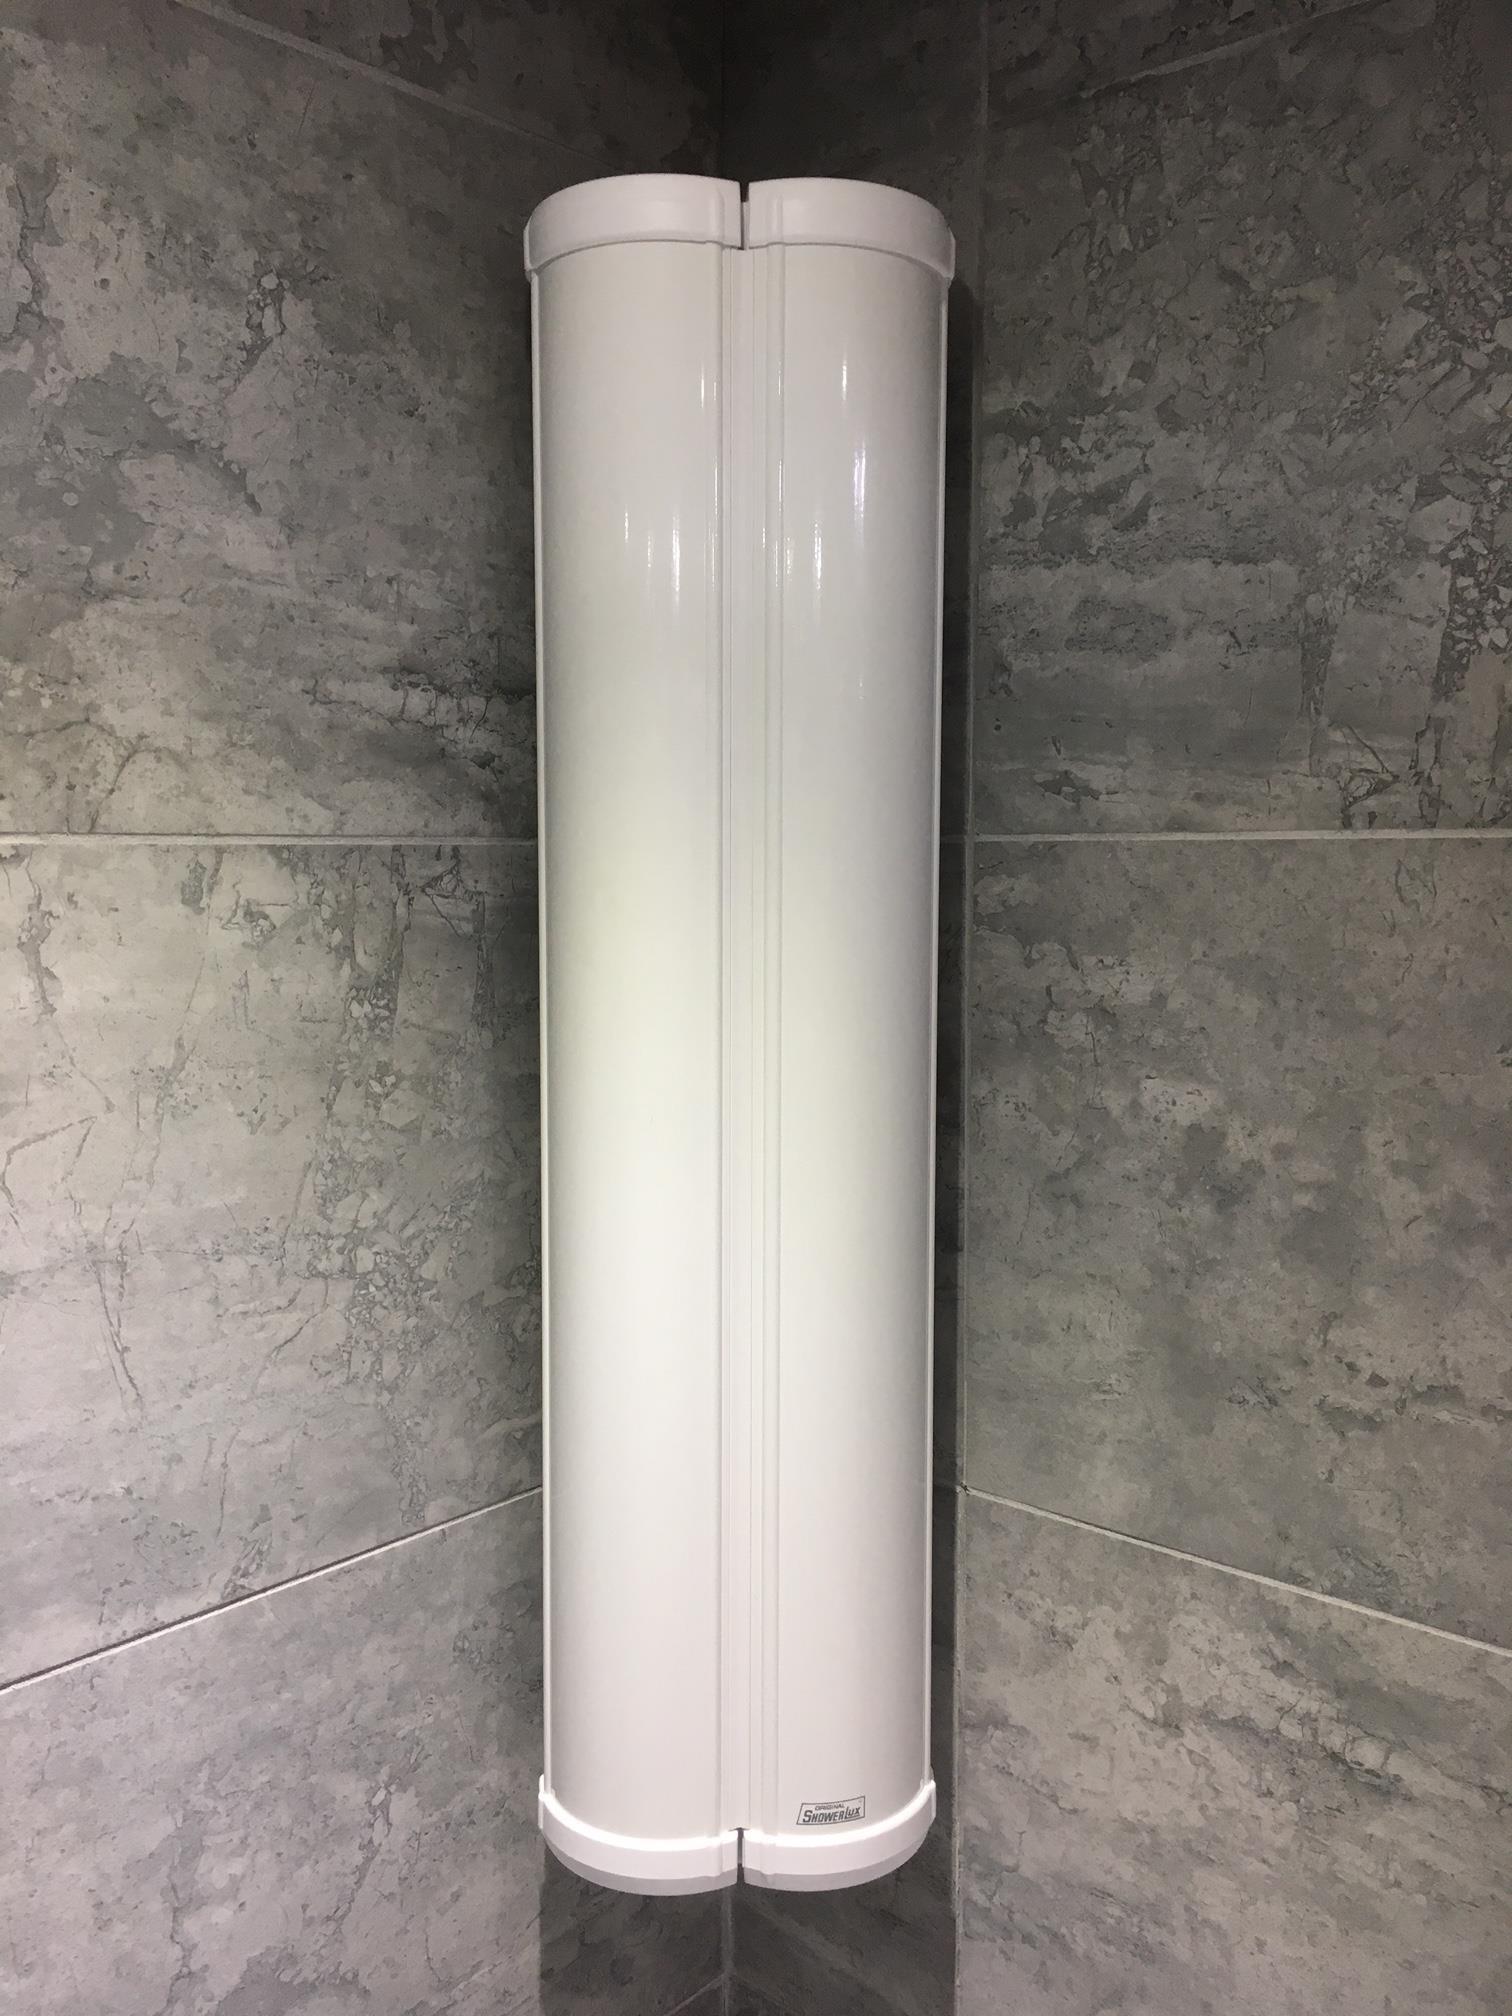 Showerlux Stowaway Shower Caddy Soap Shampoo Holder In